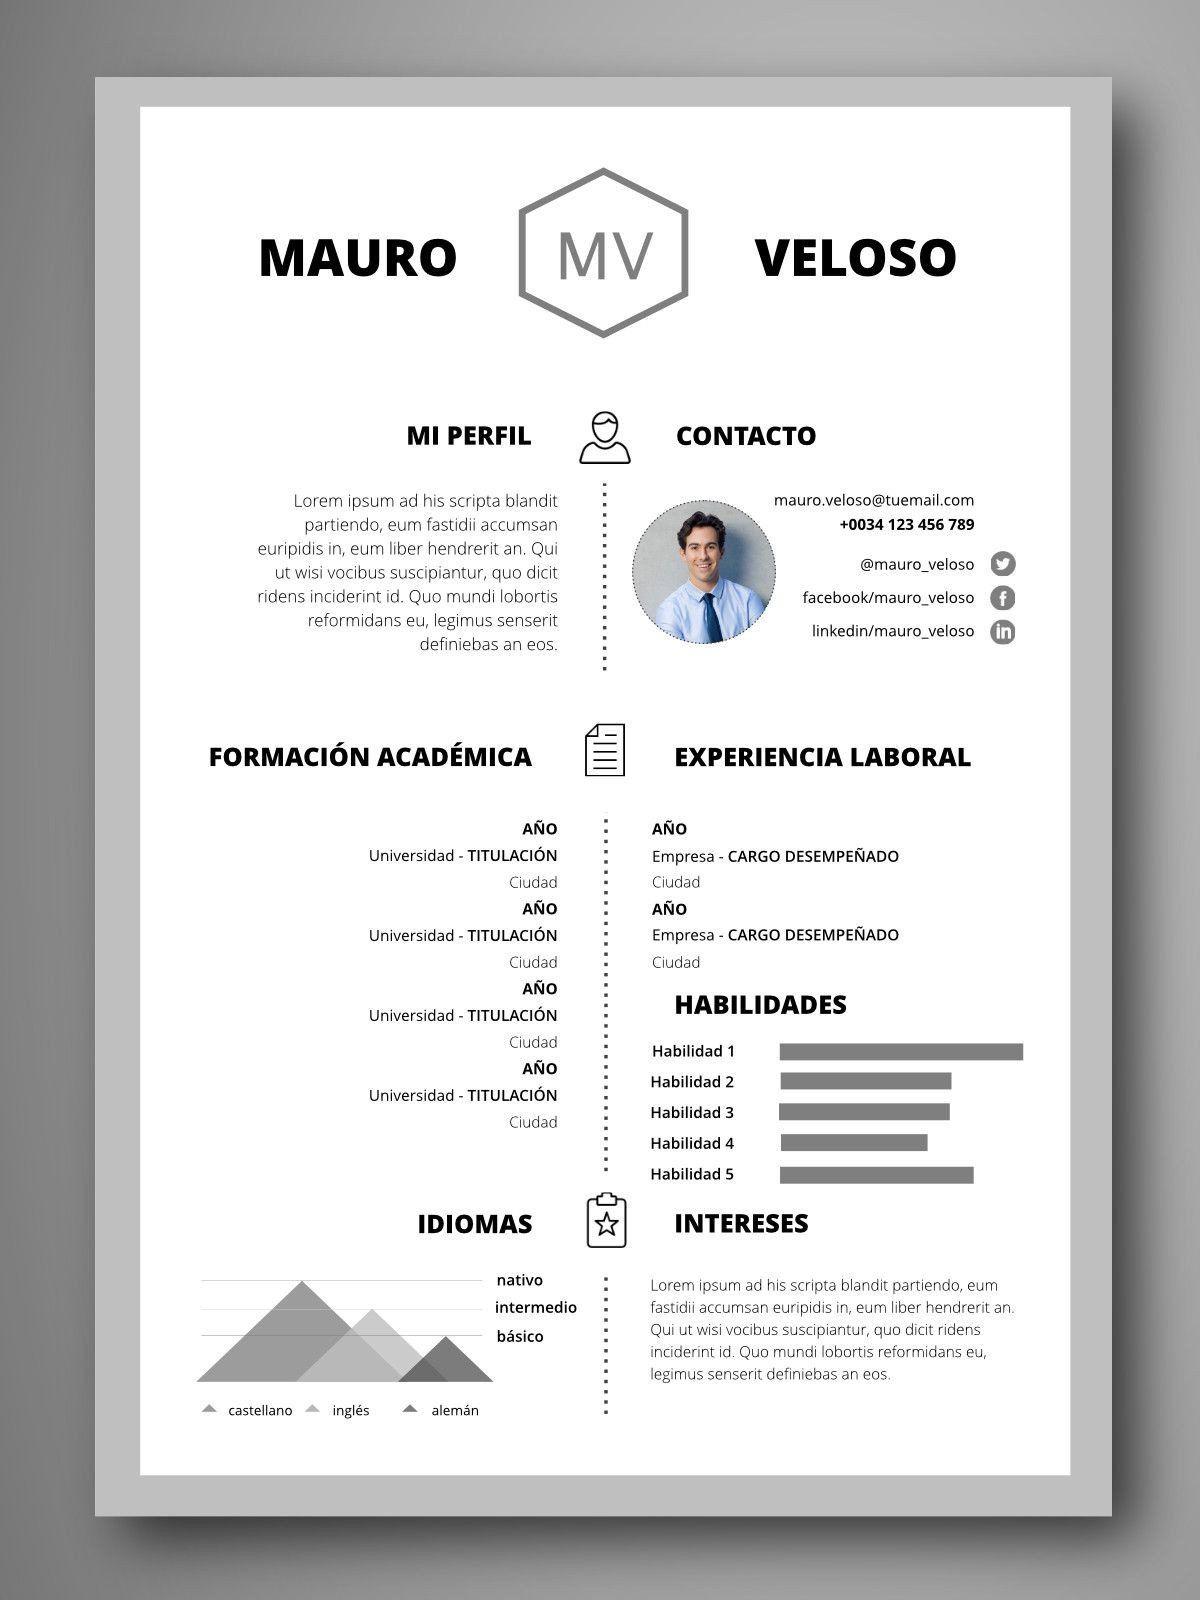 Como Hacer Un Resume De Trabajo Lovely Currculum Berl N Portafolio Resume Words Resume Design Creative Resume Design